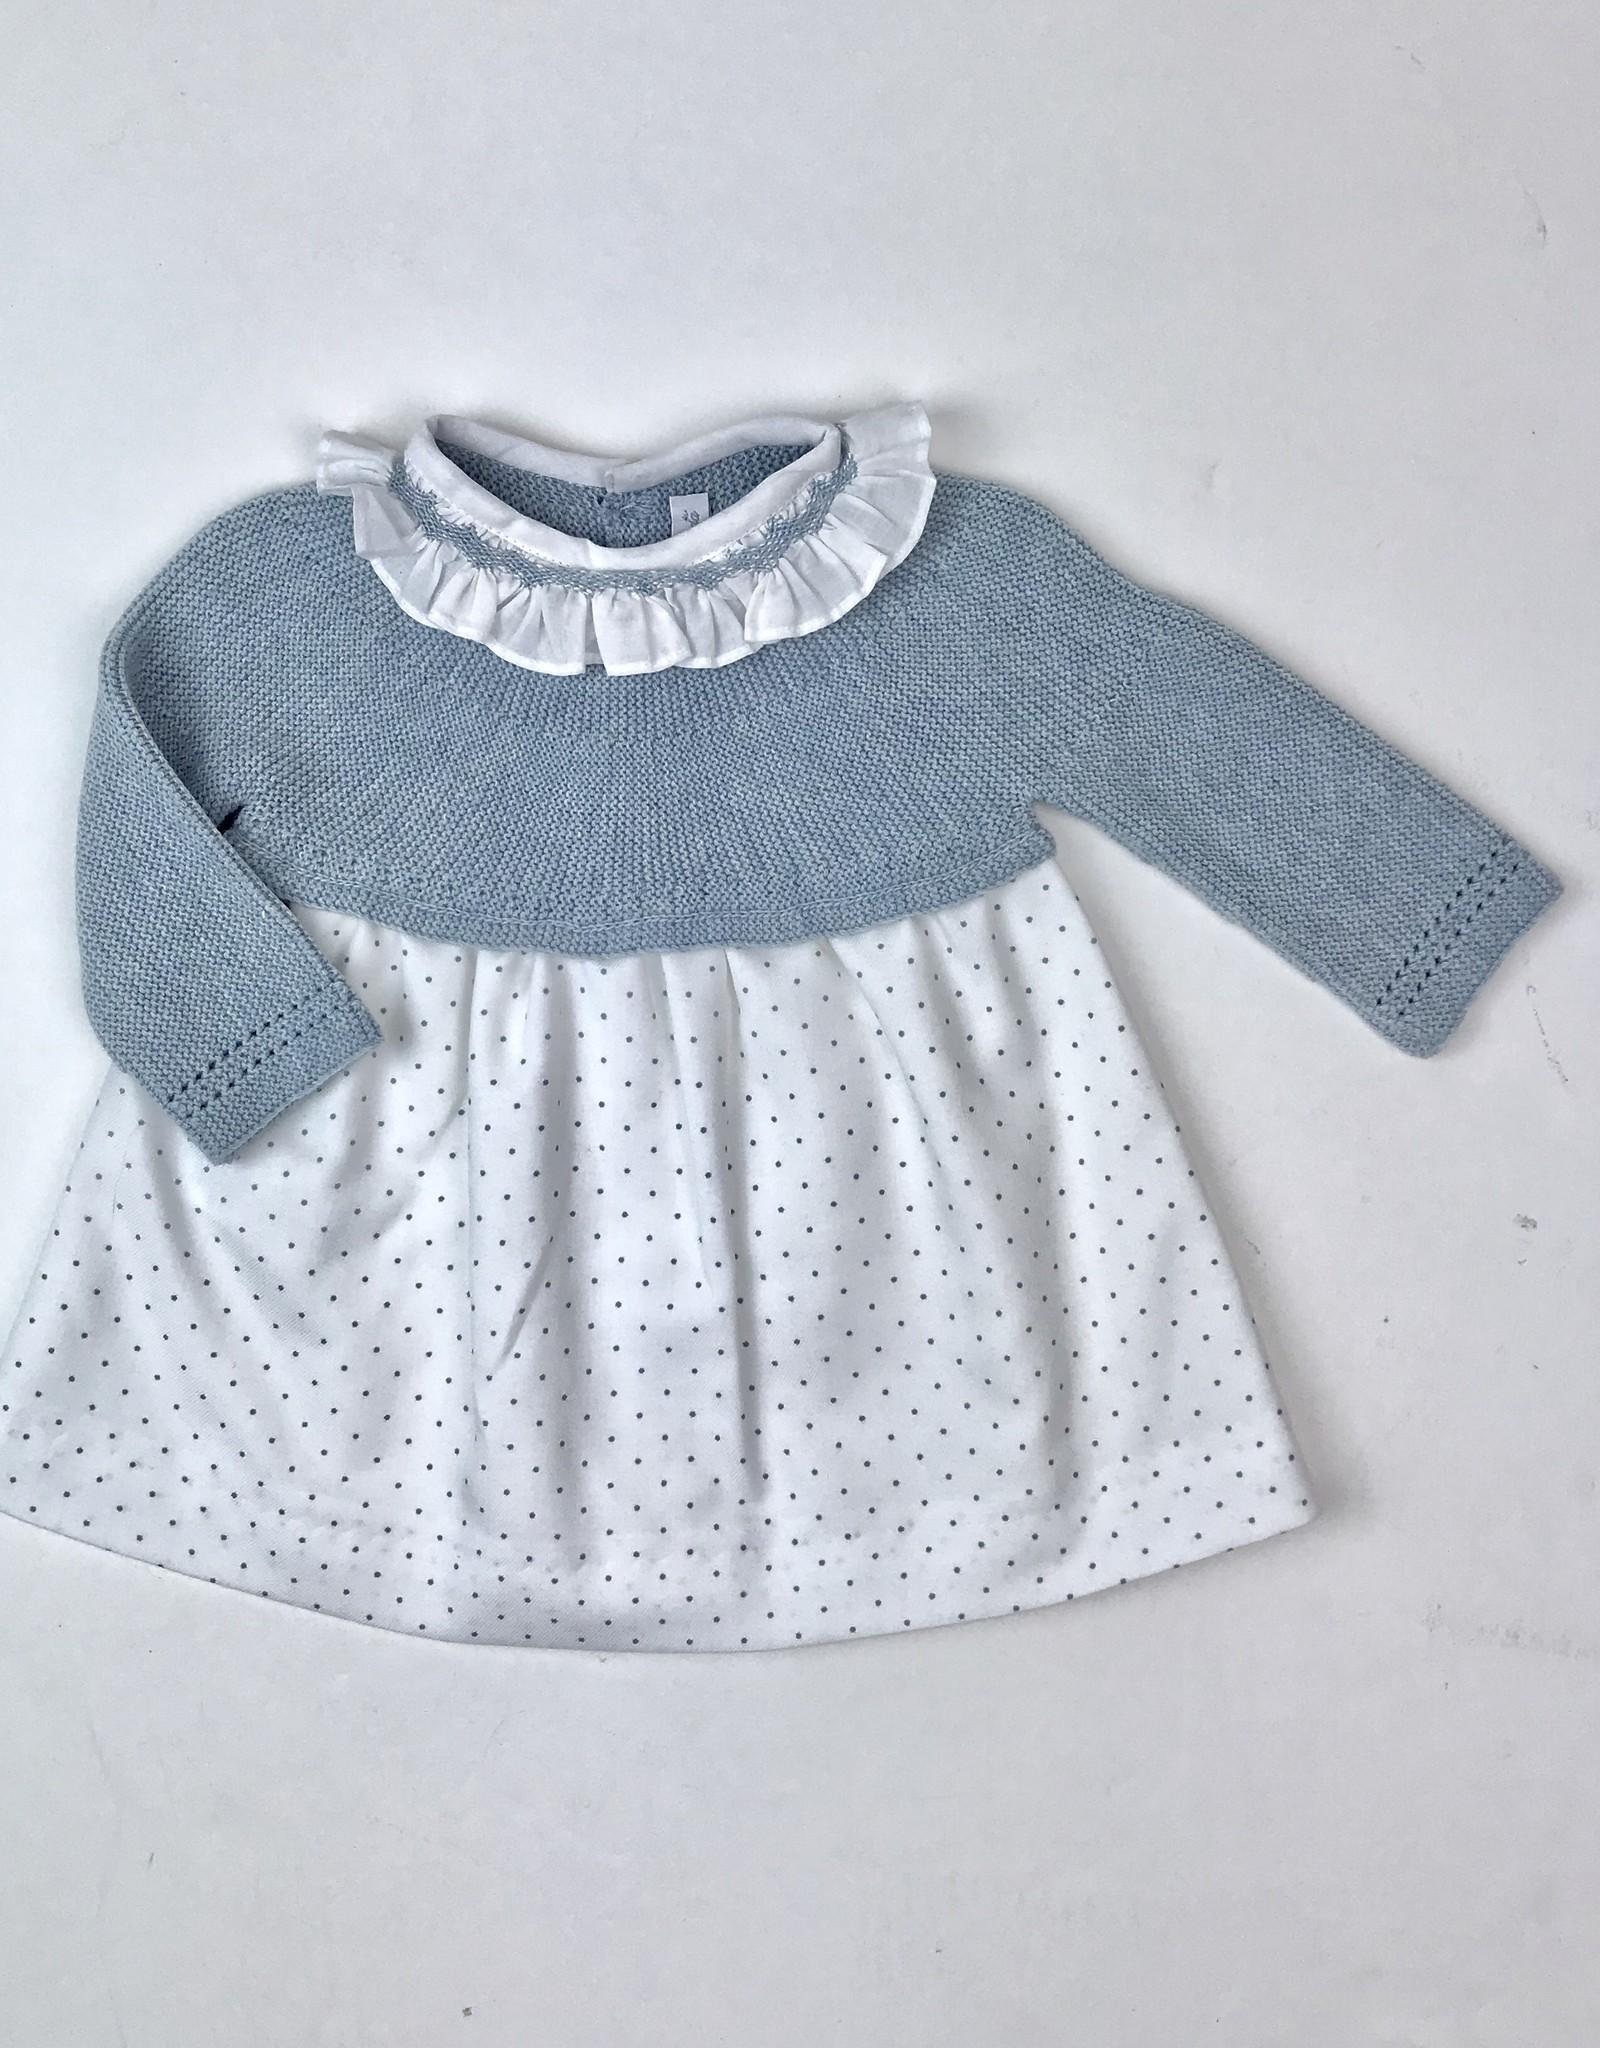 Martin Aranda Infant Heather Blue Knitted Dress with Dot Skirt